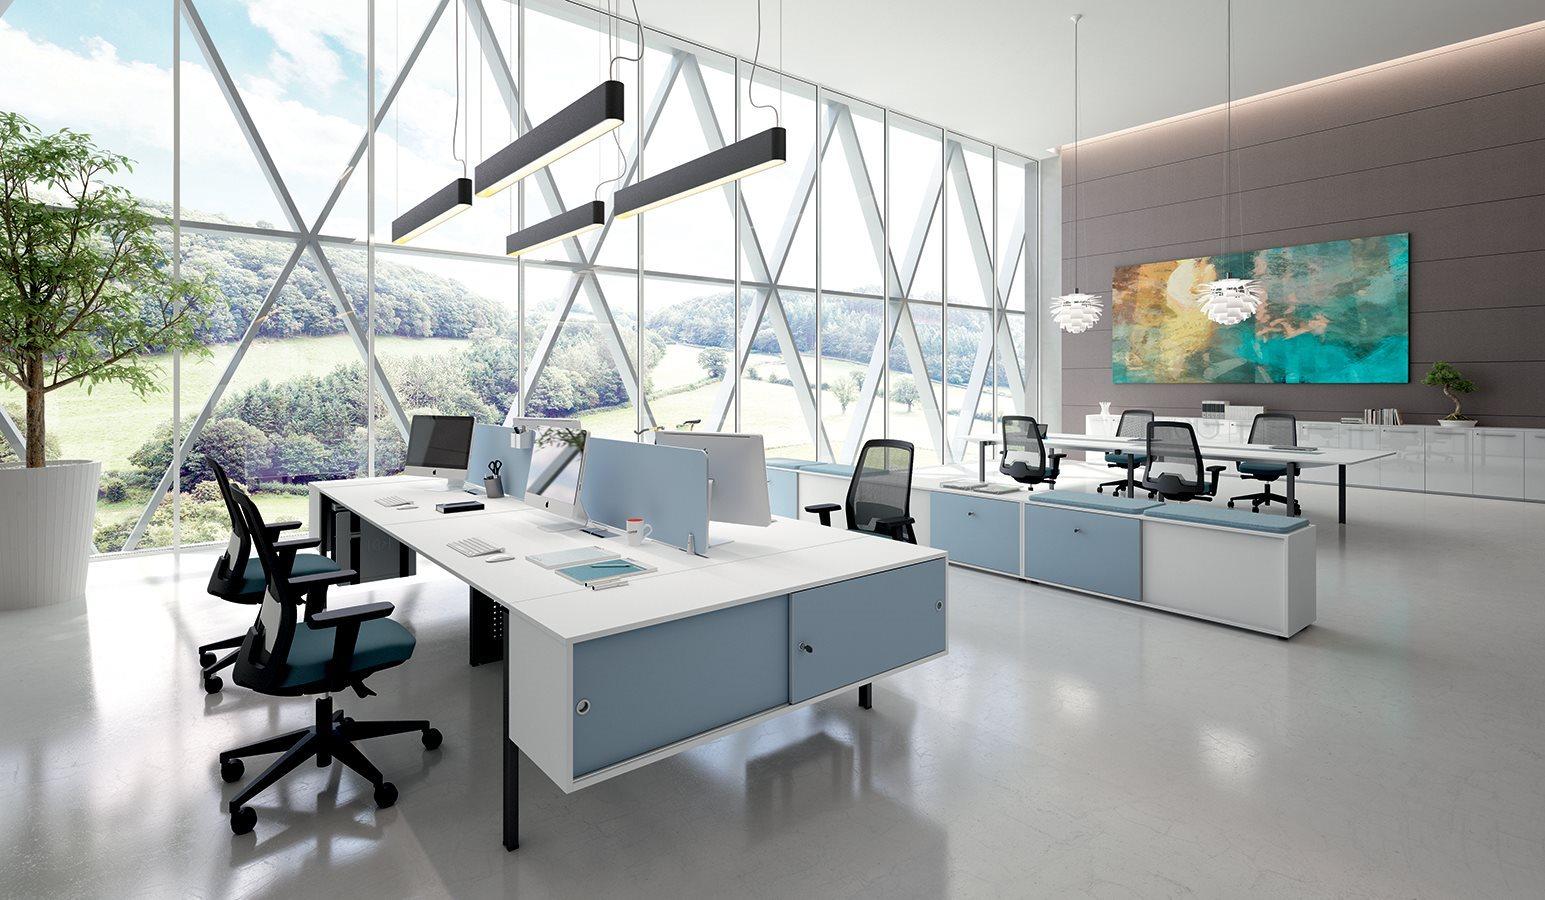 operative 20 plan urban office. Black Bedroom Furniture Sets. Home Design Ideas